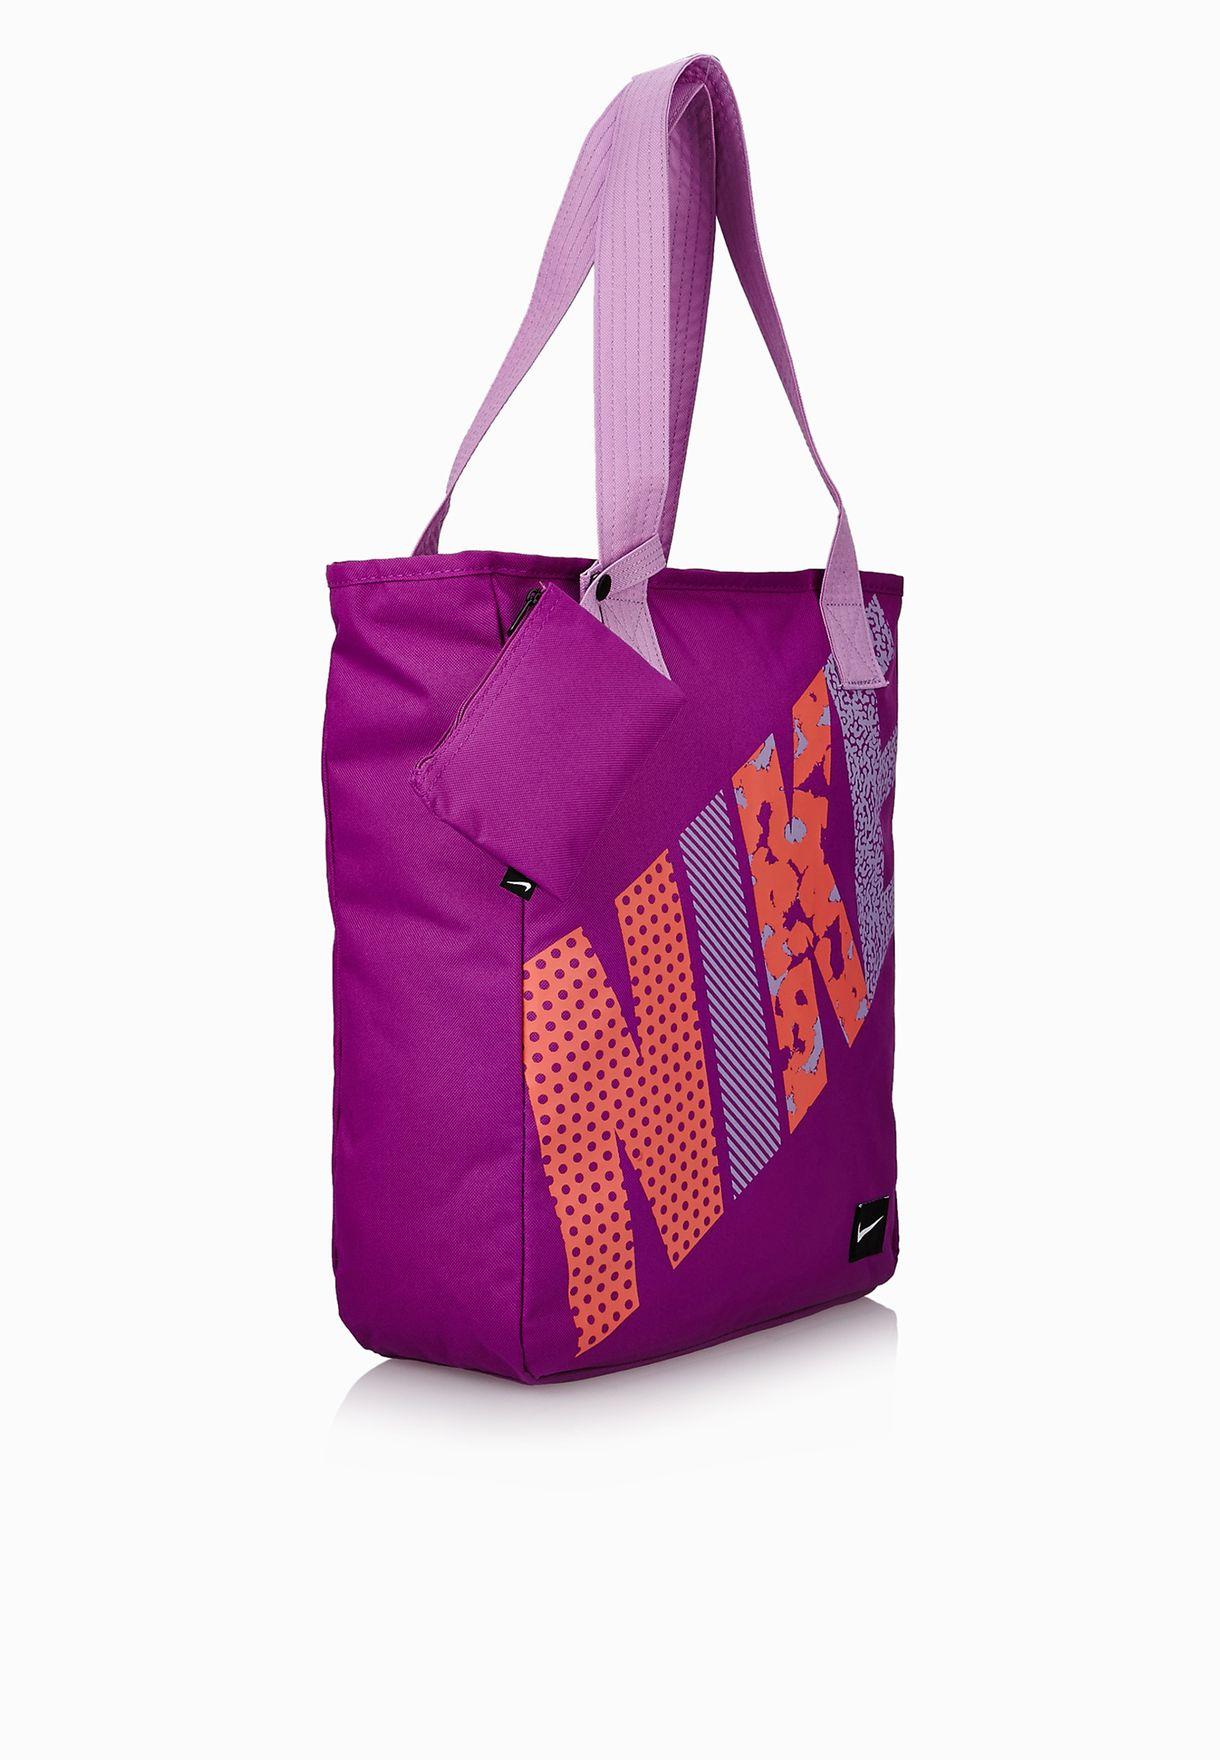 7ecdaf240714 Shop Nike purple Rowena Tote BA4666-566 for Women in Saudi ...